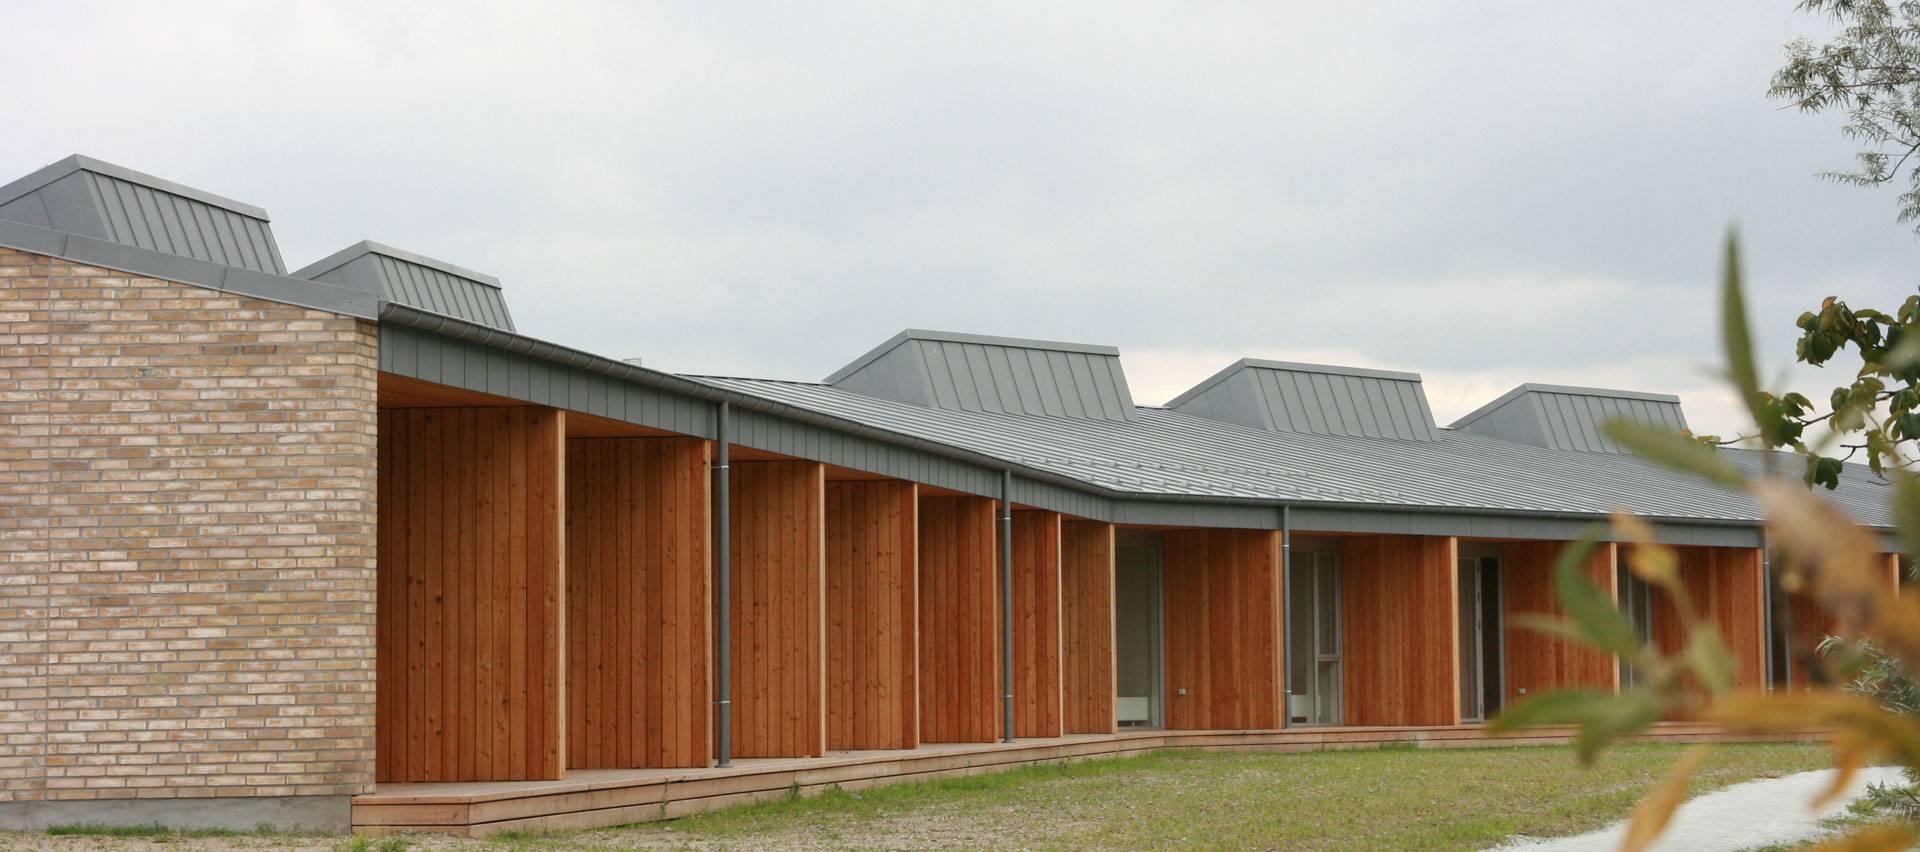 Hospice Soendergaard by Henning Larsen Architects